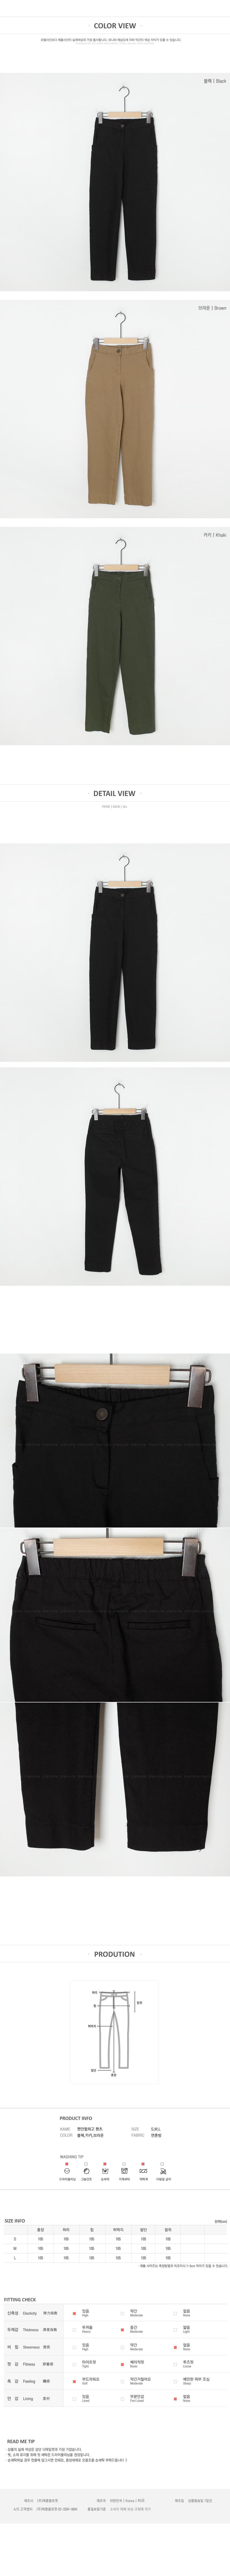 Comfortable top pants